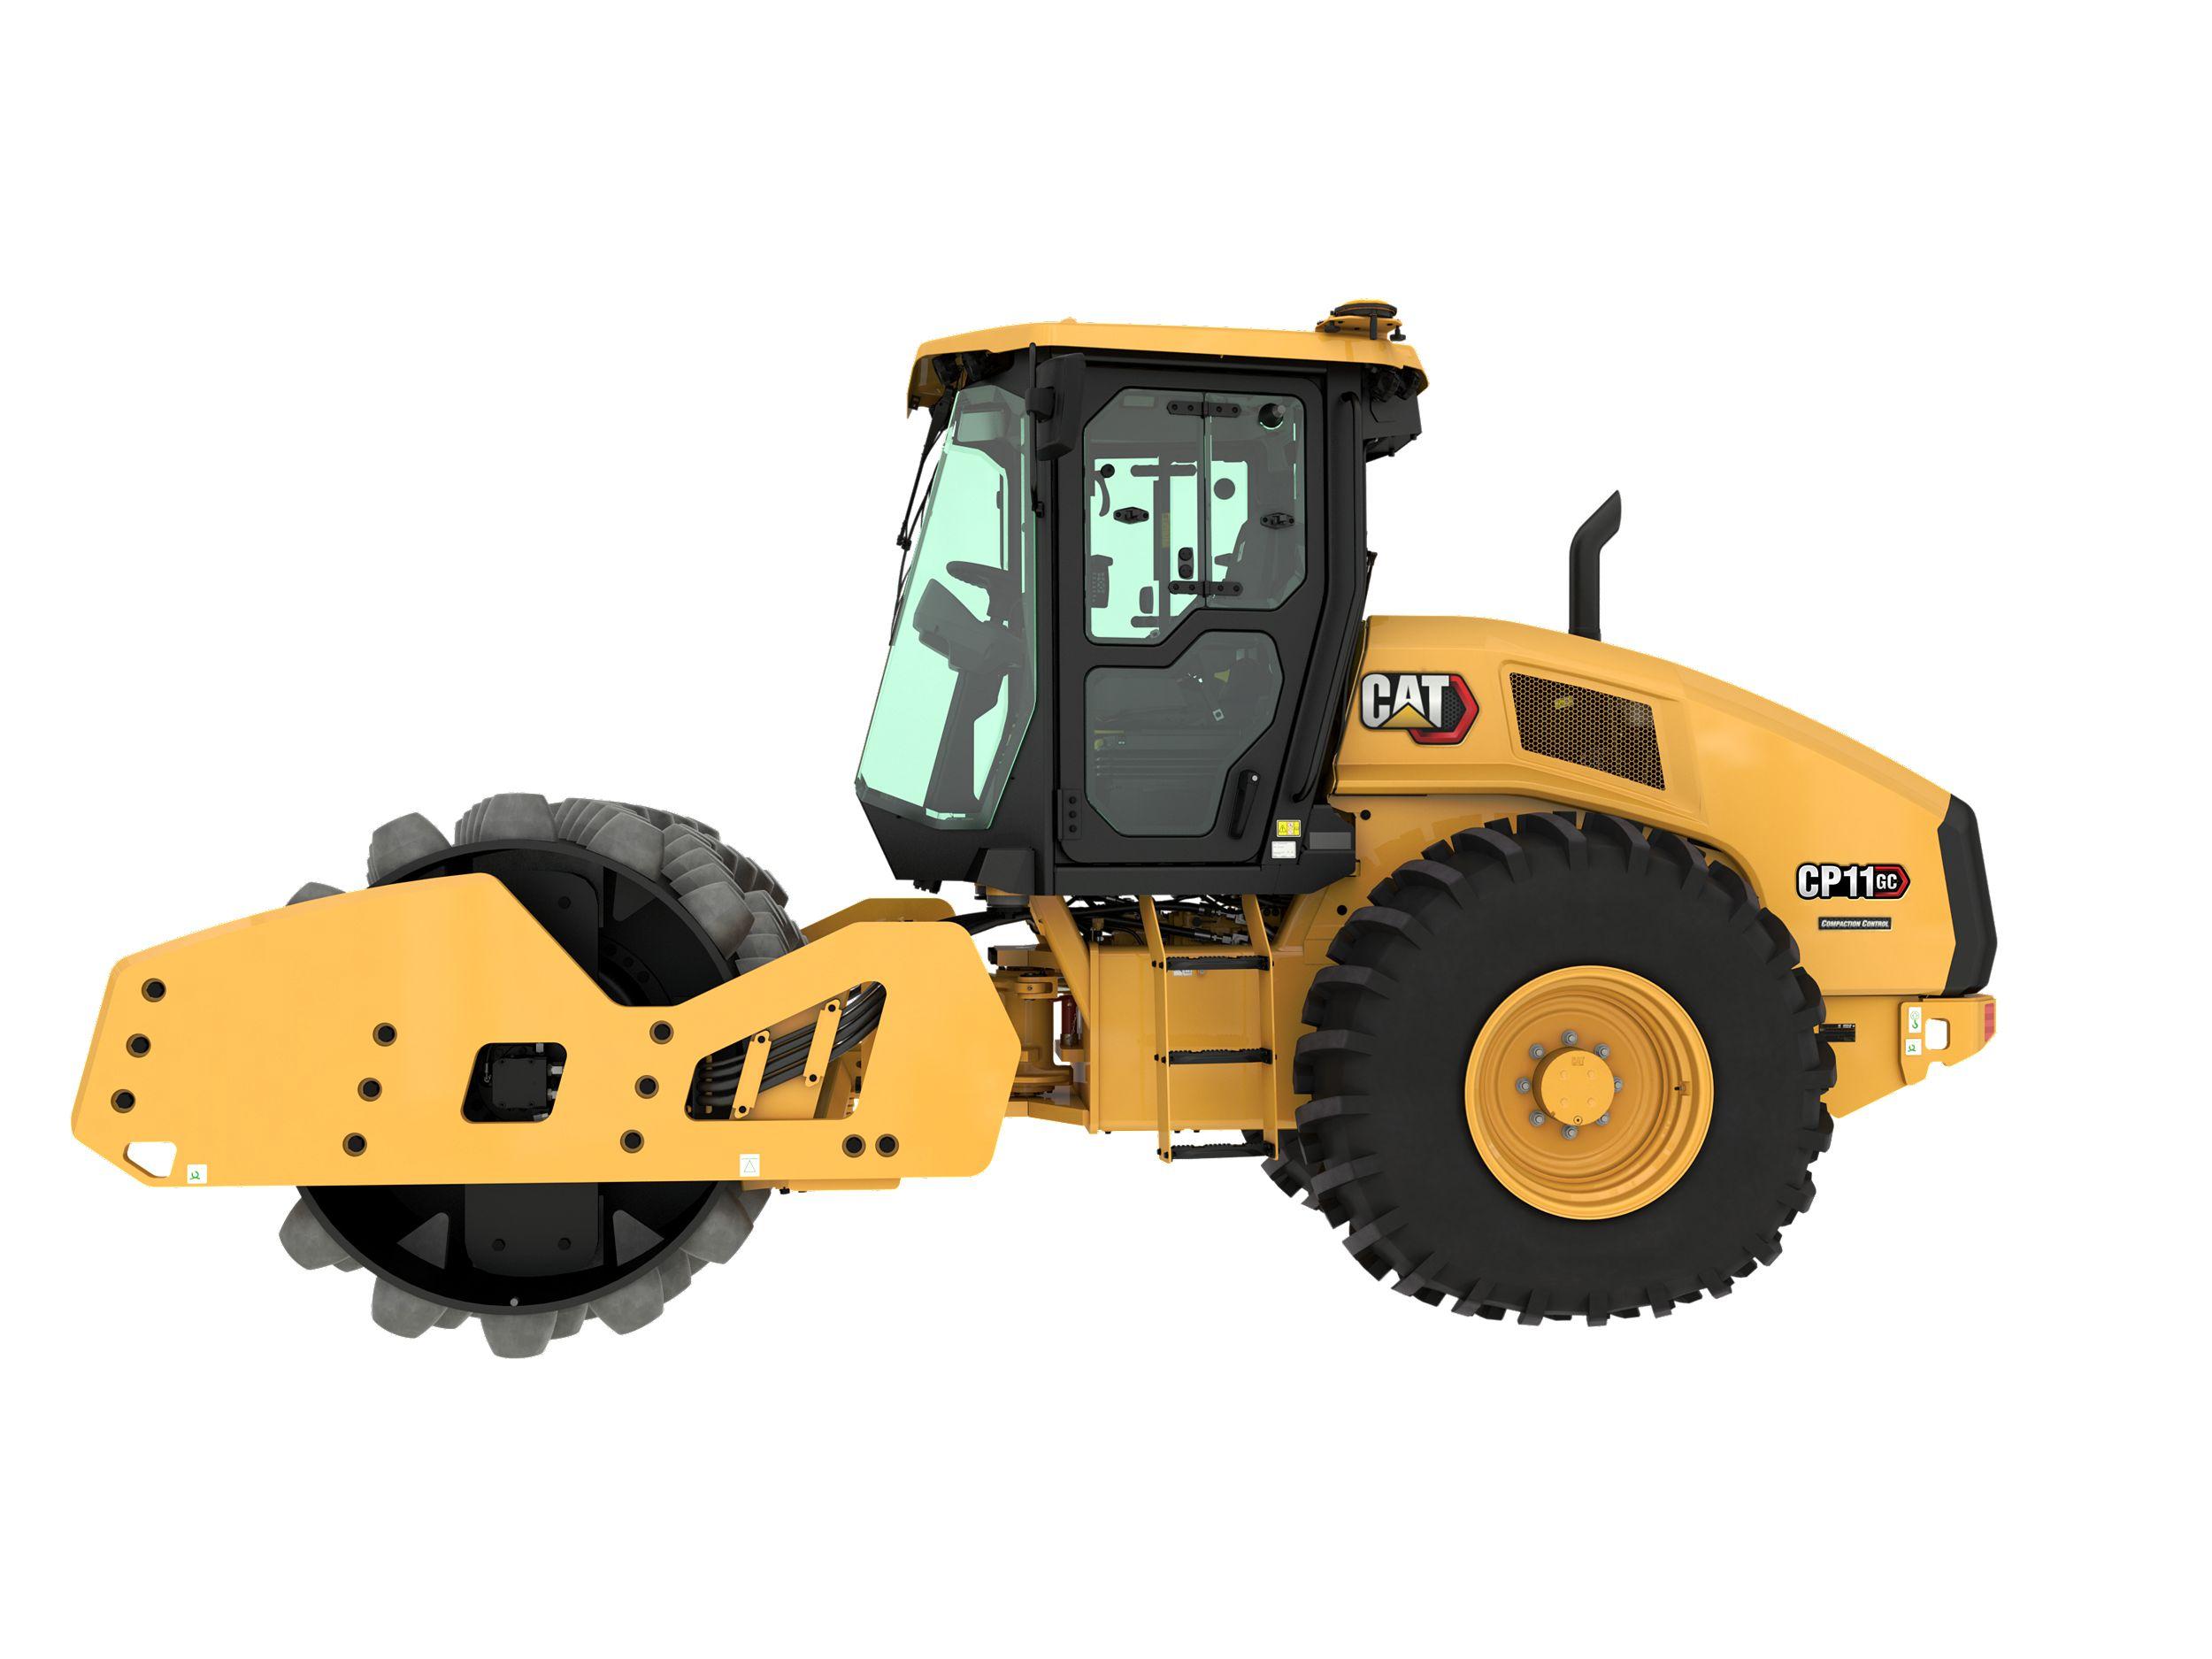 CP11 GC Vibratory Soil Compactor